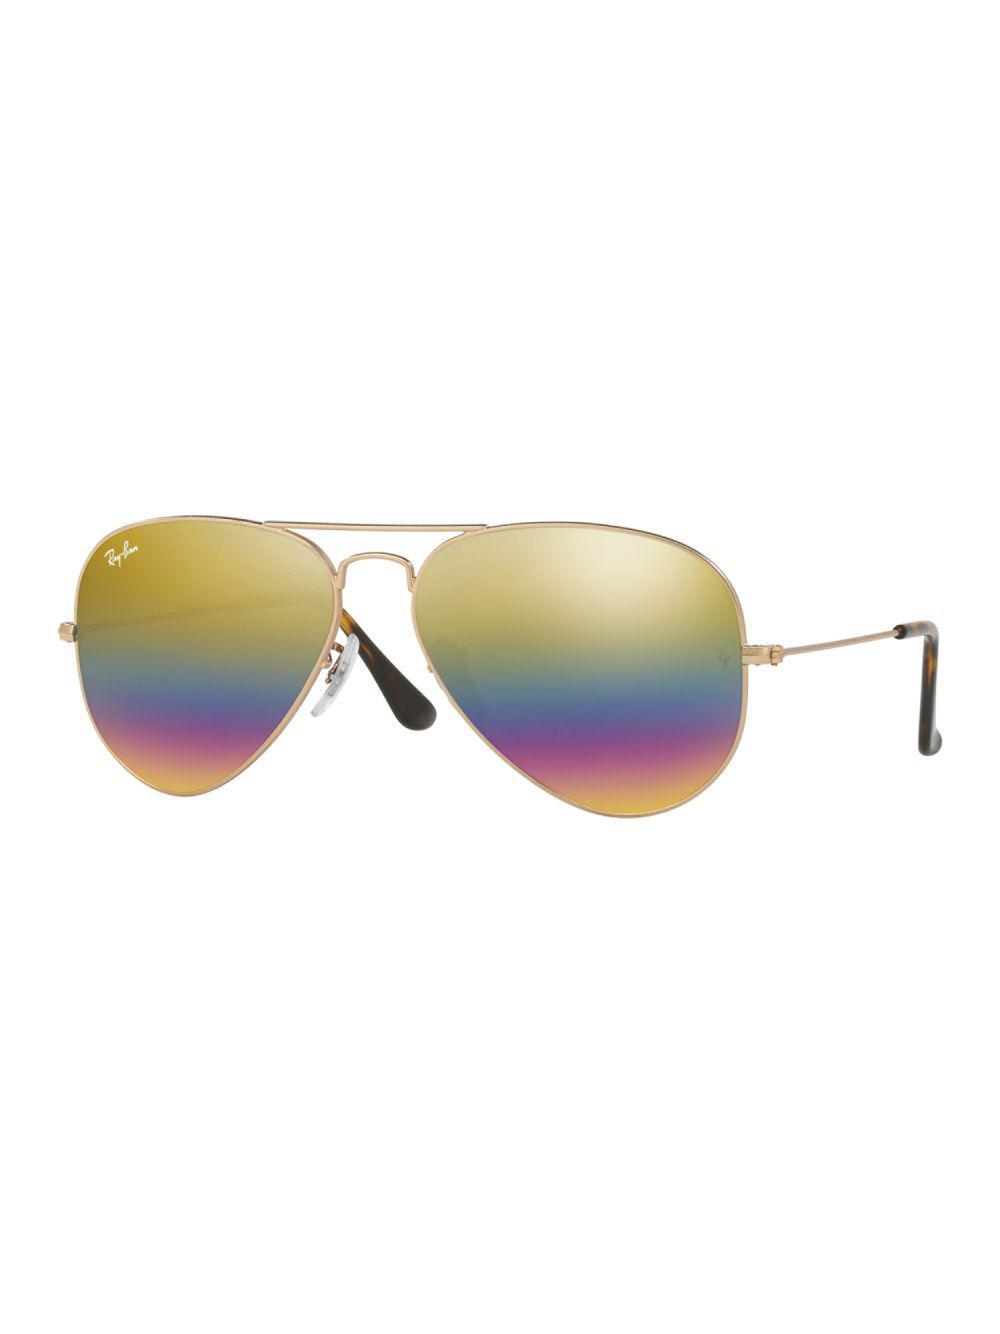 38dd2fab4a Ray-Ban 14mm Flash Aviator Sunglasses in Yellow - Lyst